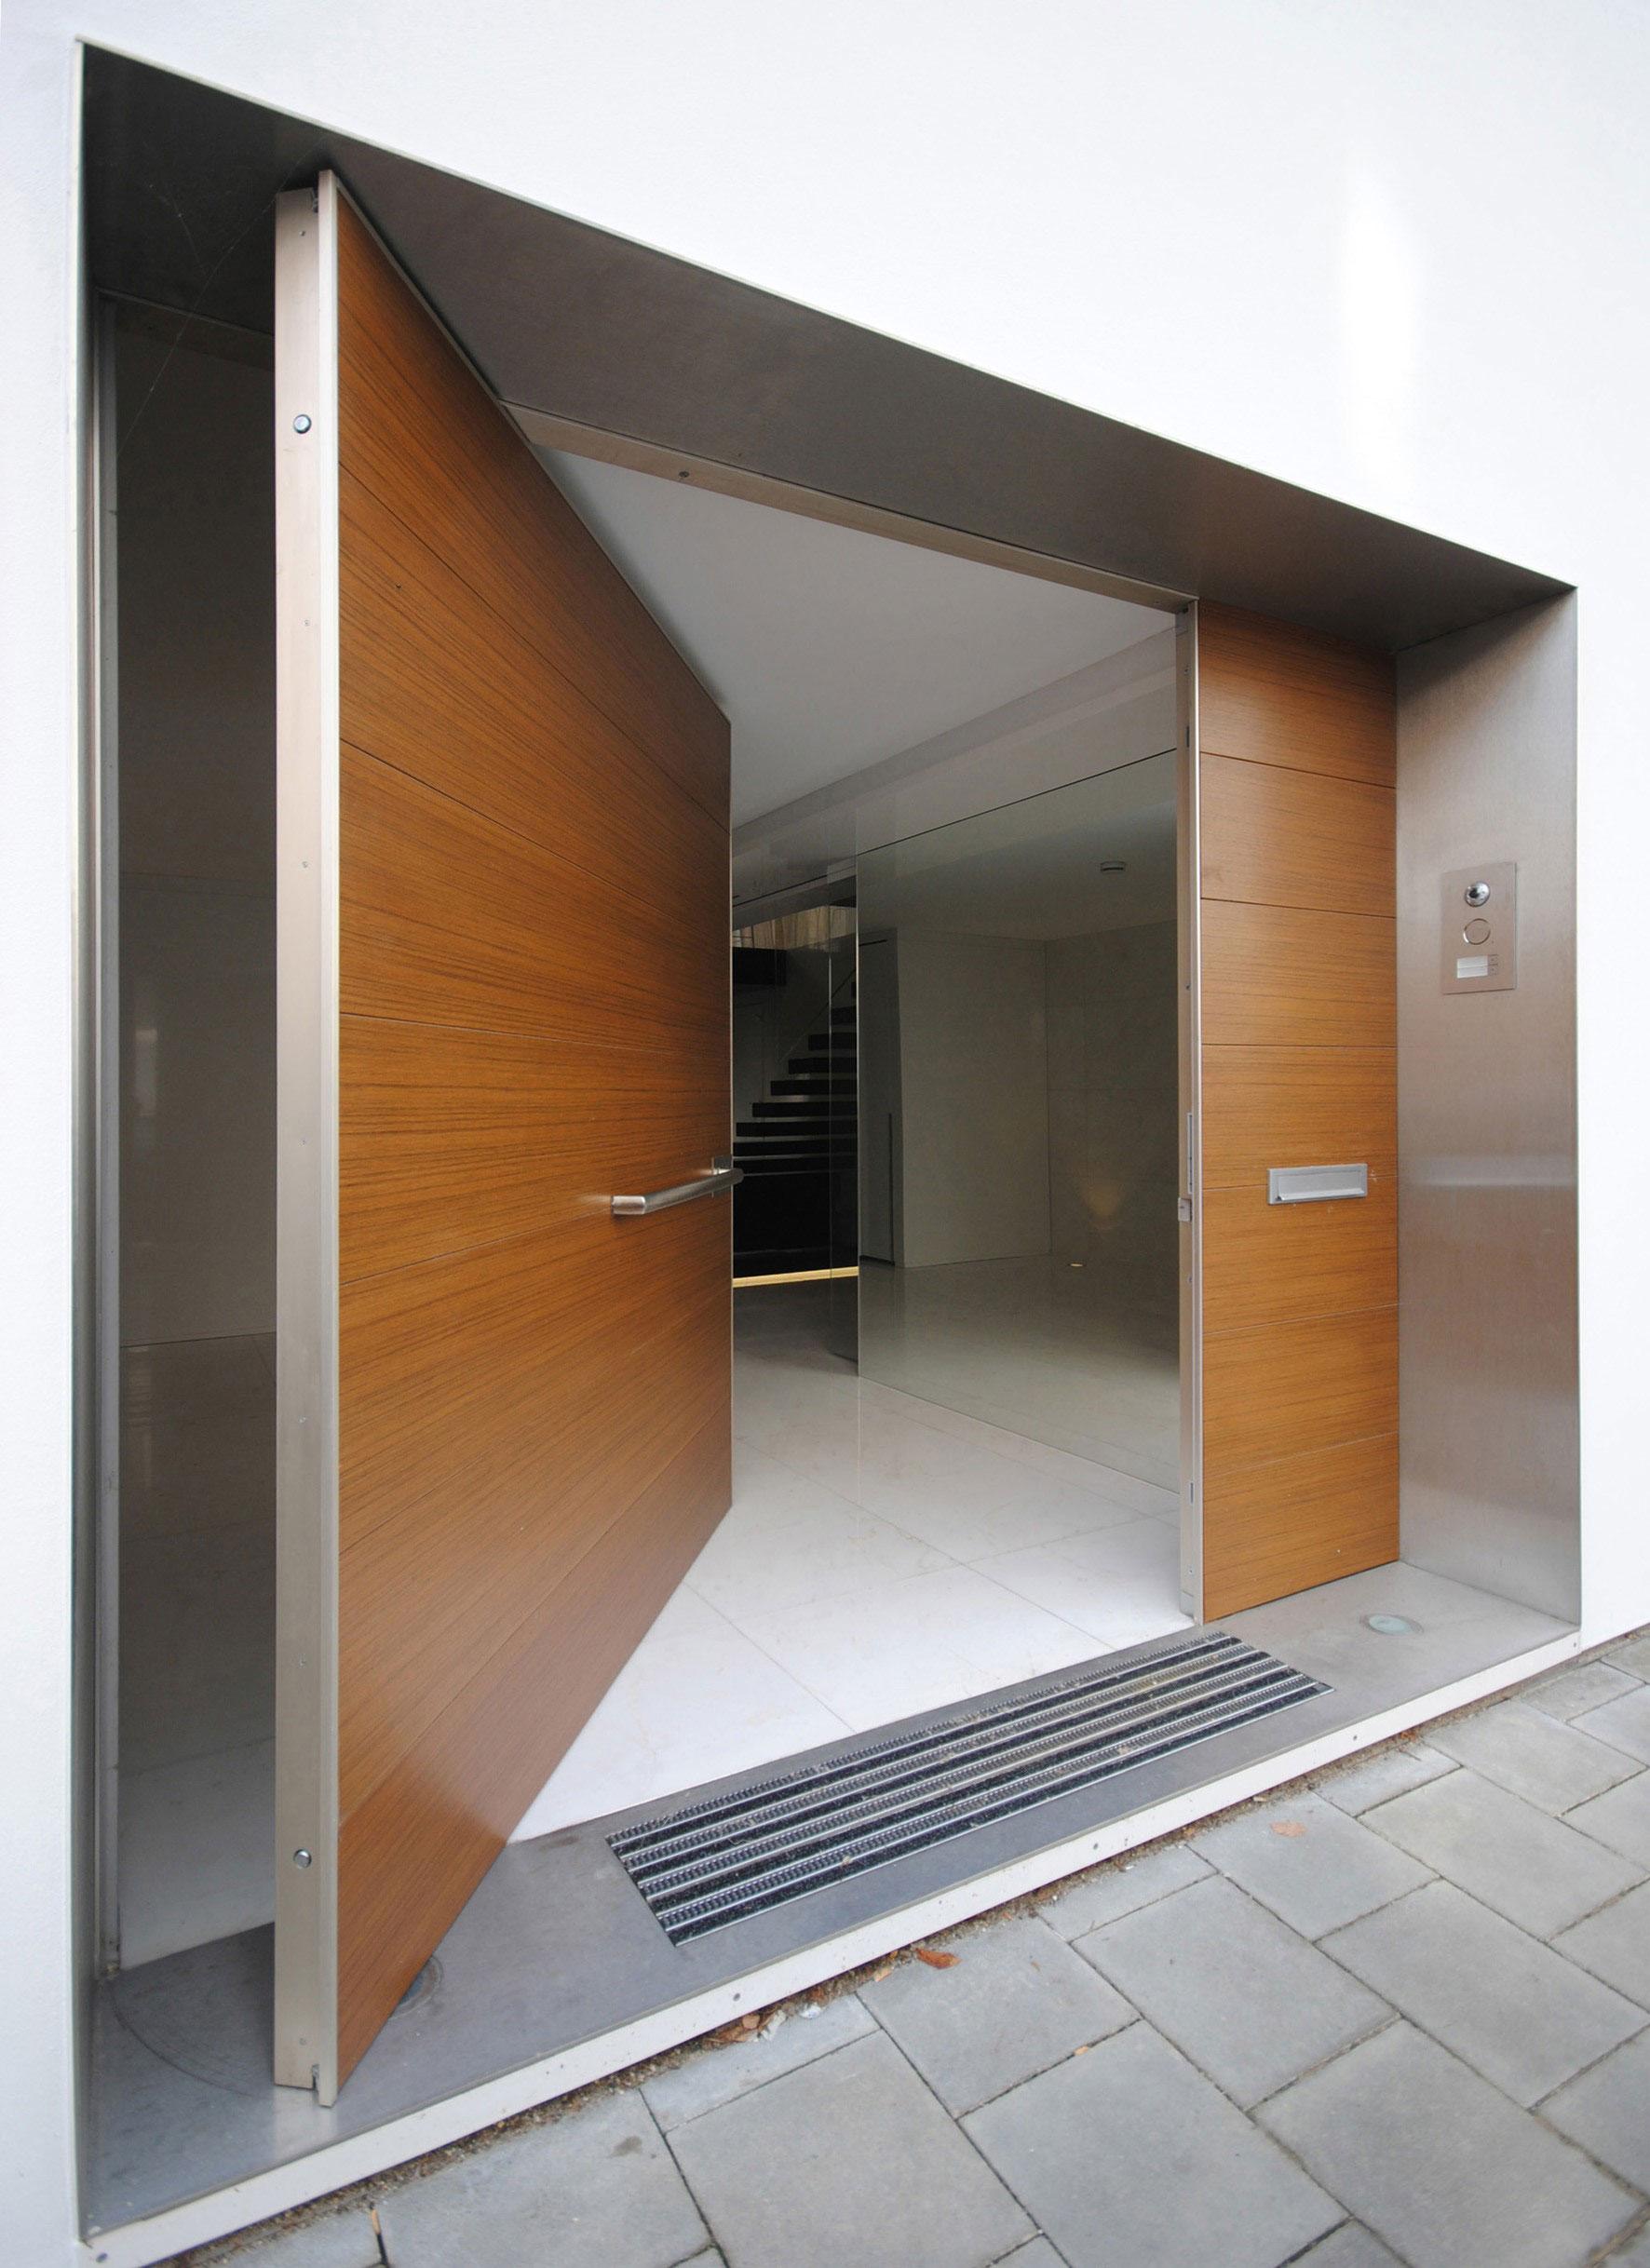 25 fotos puertas modernas para casas - Fotos de puertas ...